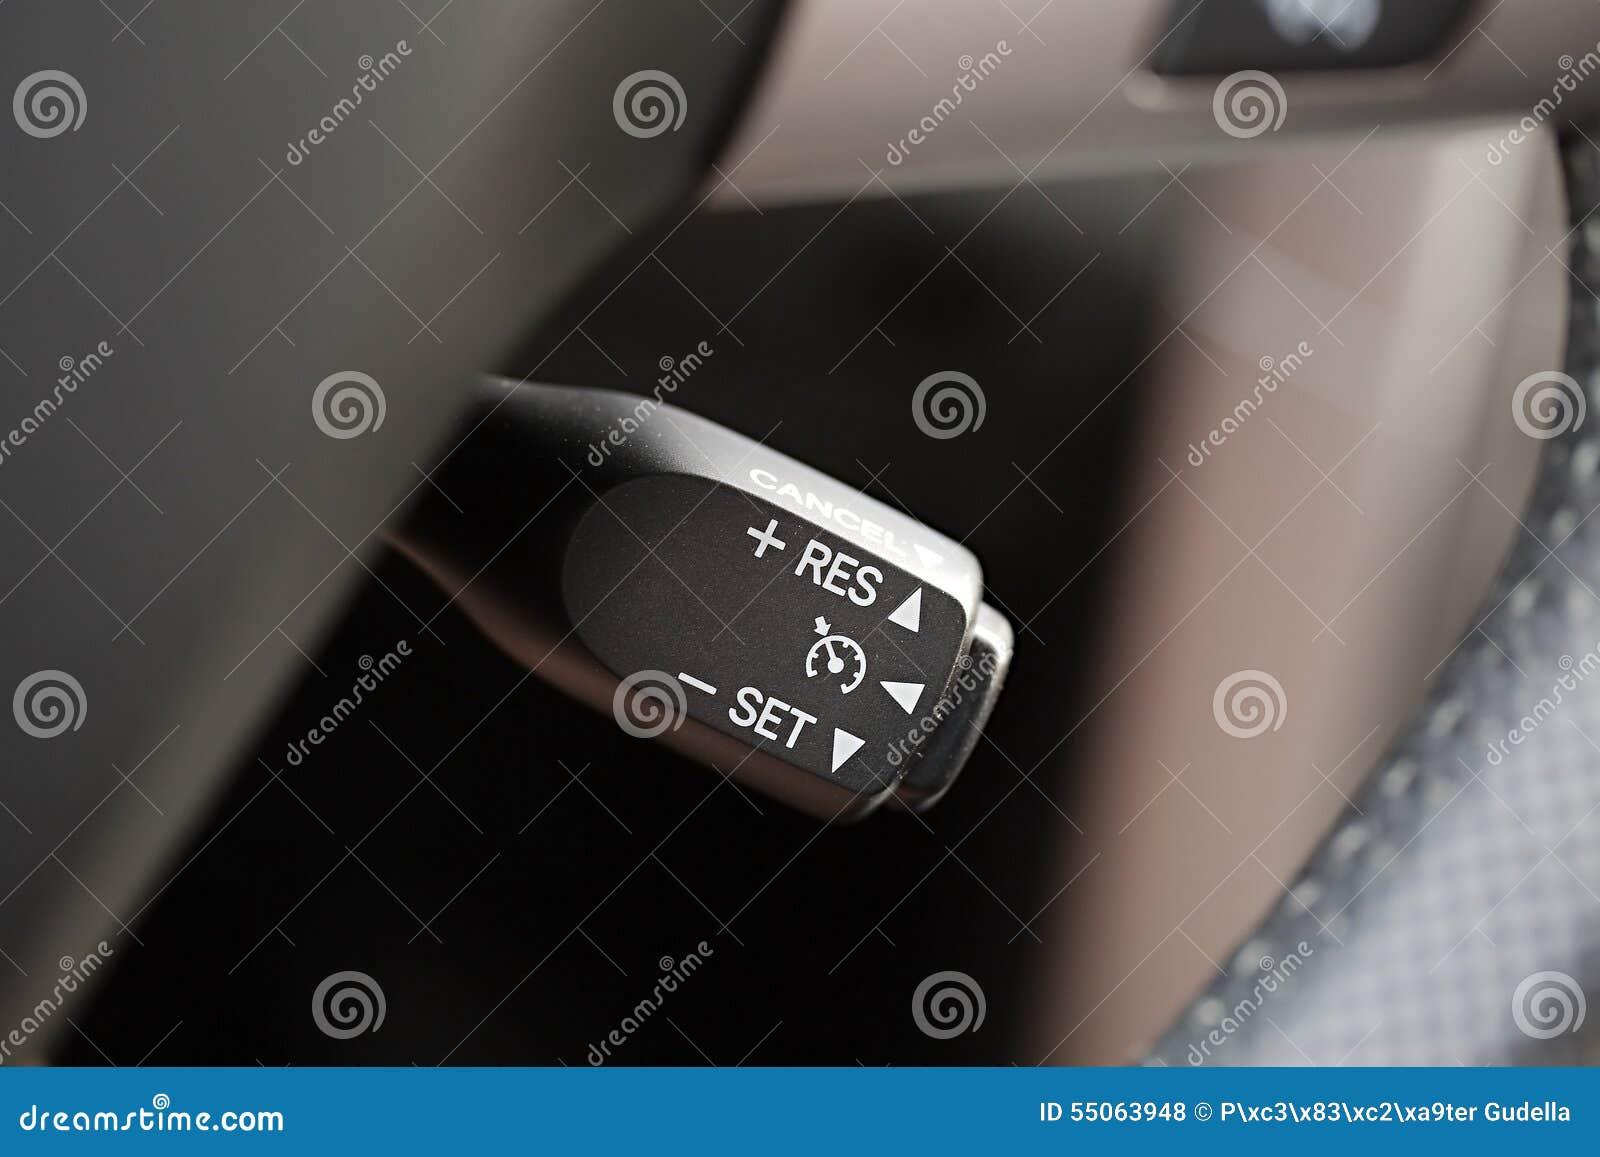 car interior royalty free stock image 55063948. Black Bedroom Furniture Sets. Home Design Ideas